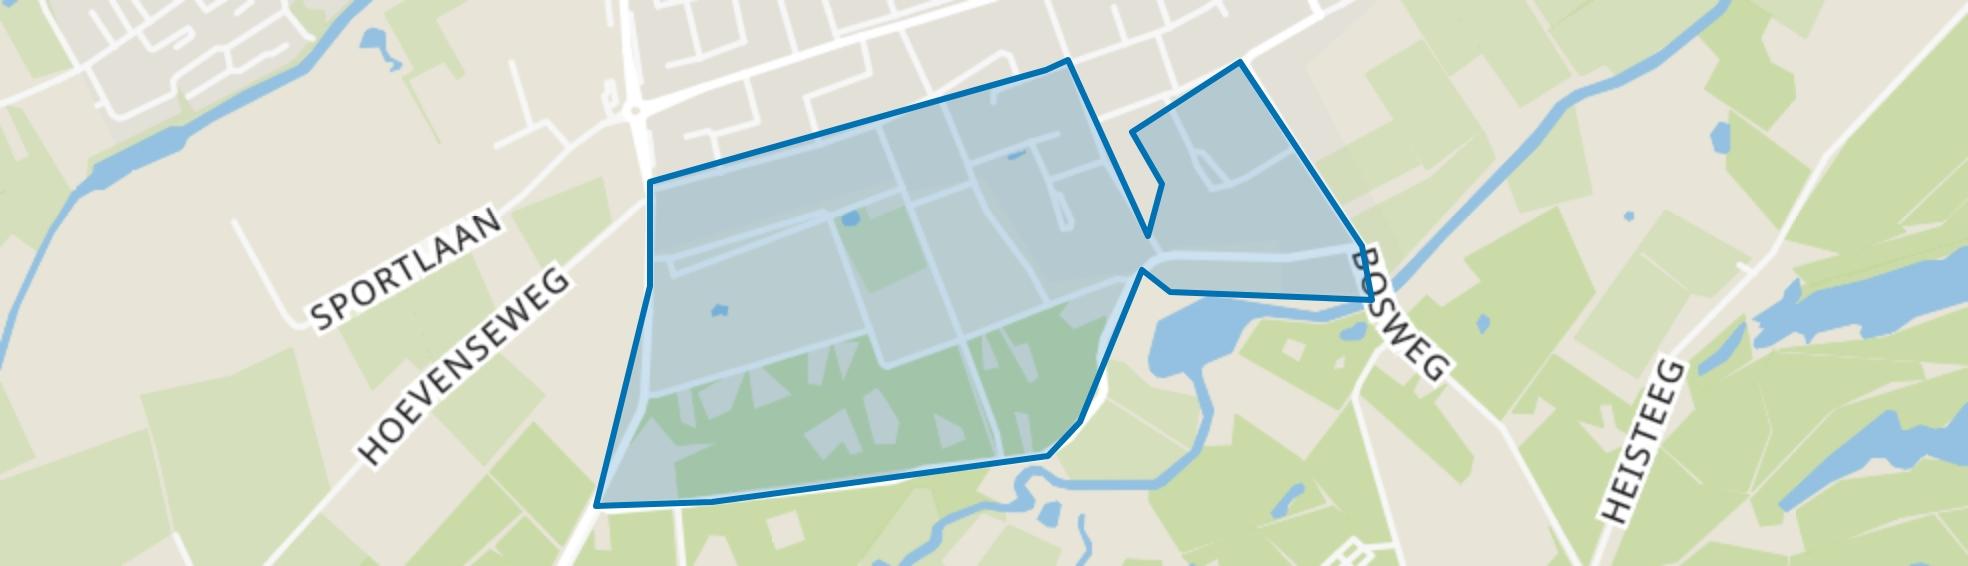 Omg. Europaln/Hondsbergseln, Oisterwijk map